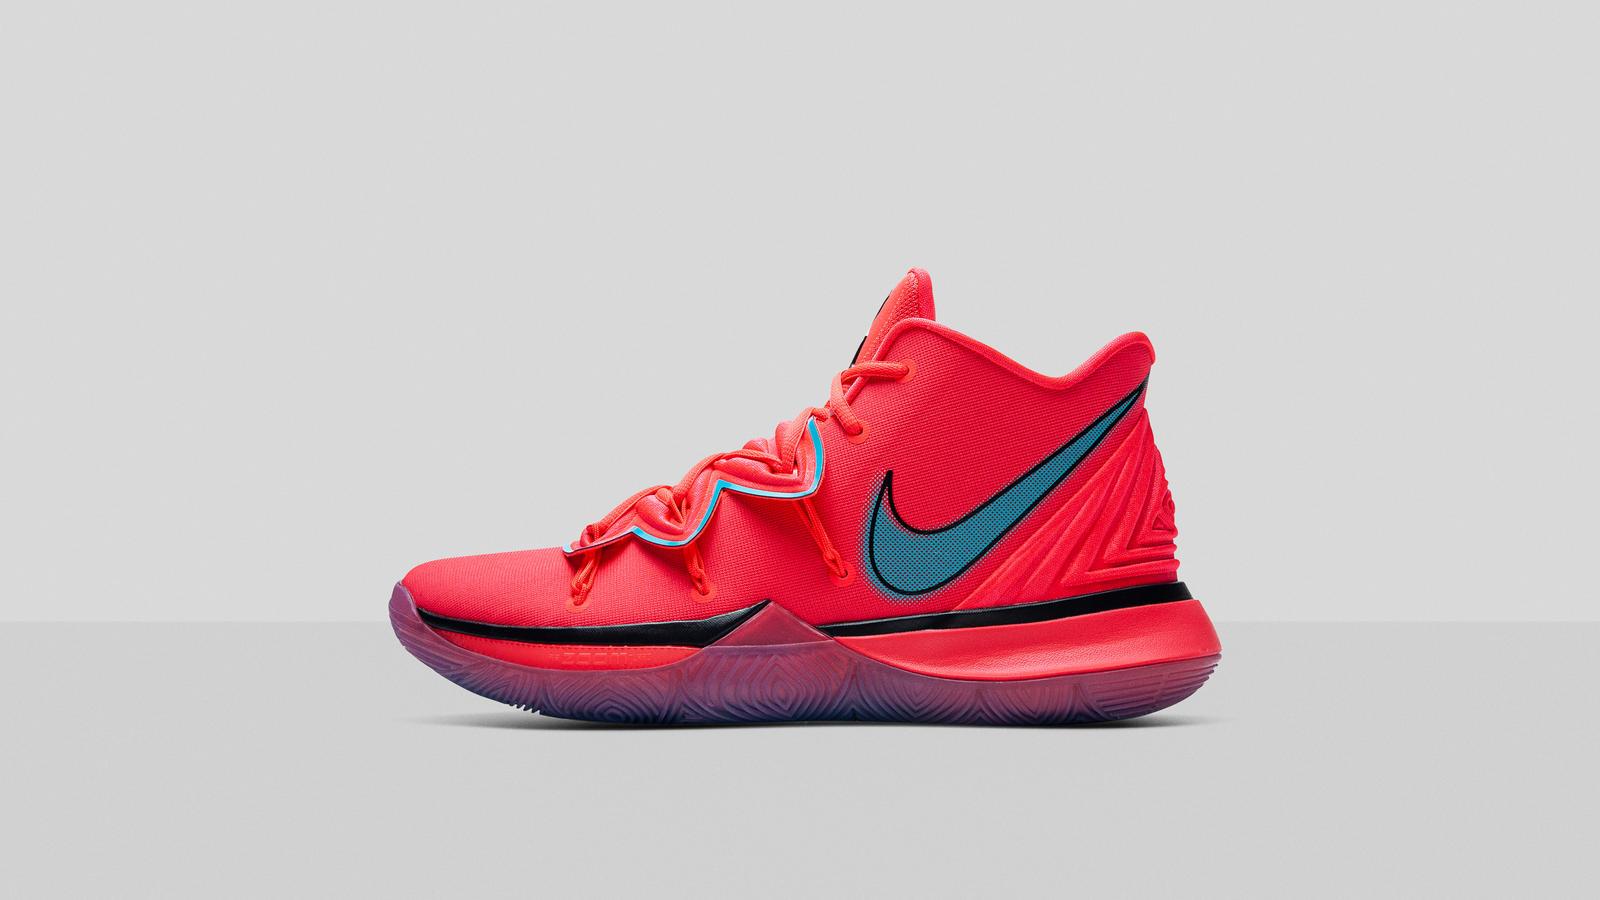 FeaturedFootwear_WNBA_ASG2019-2217_89481.jpg